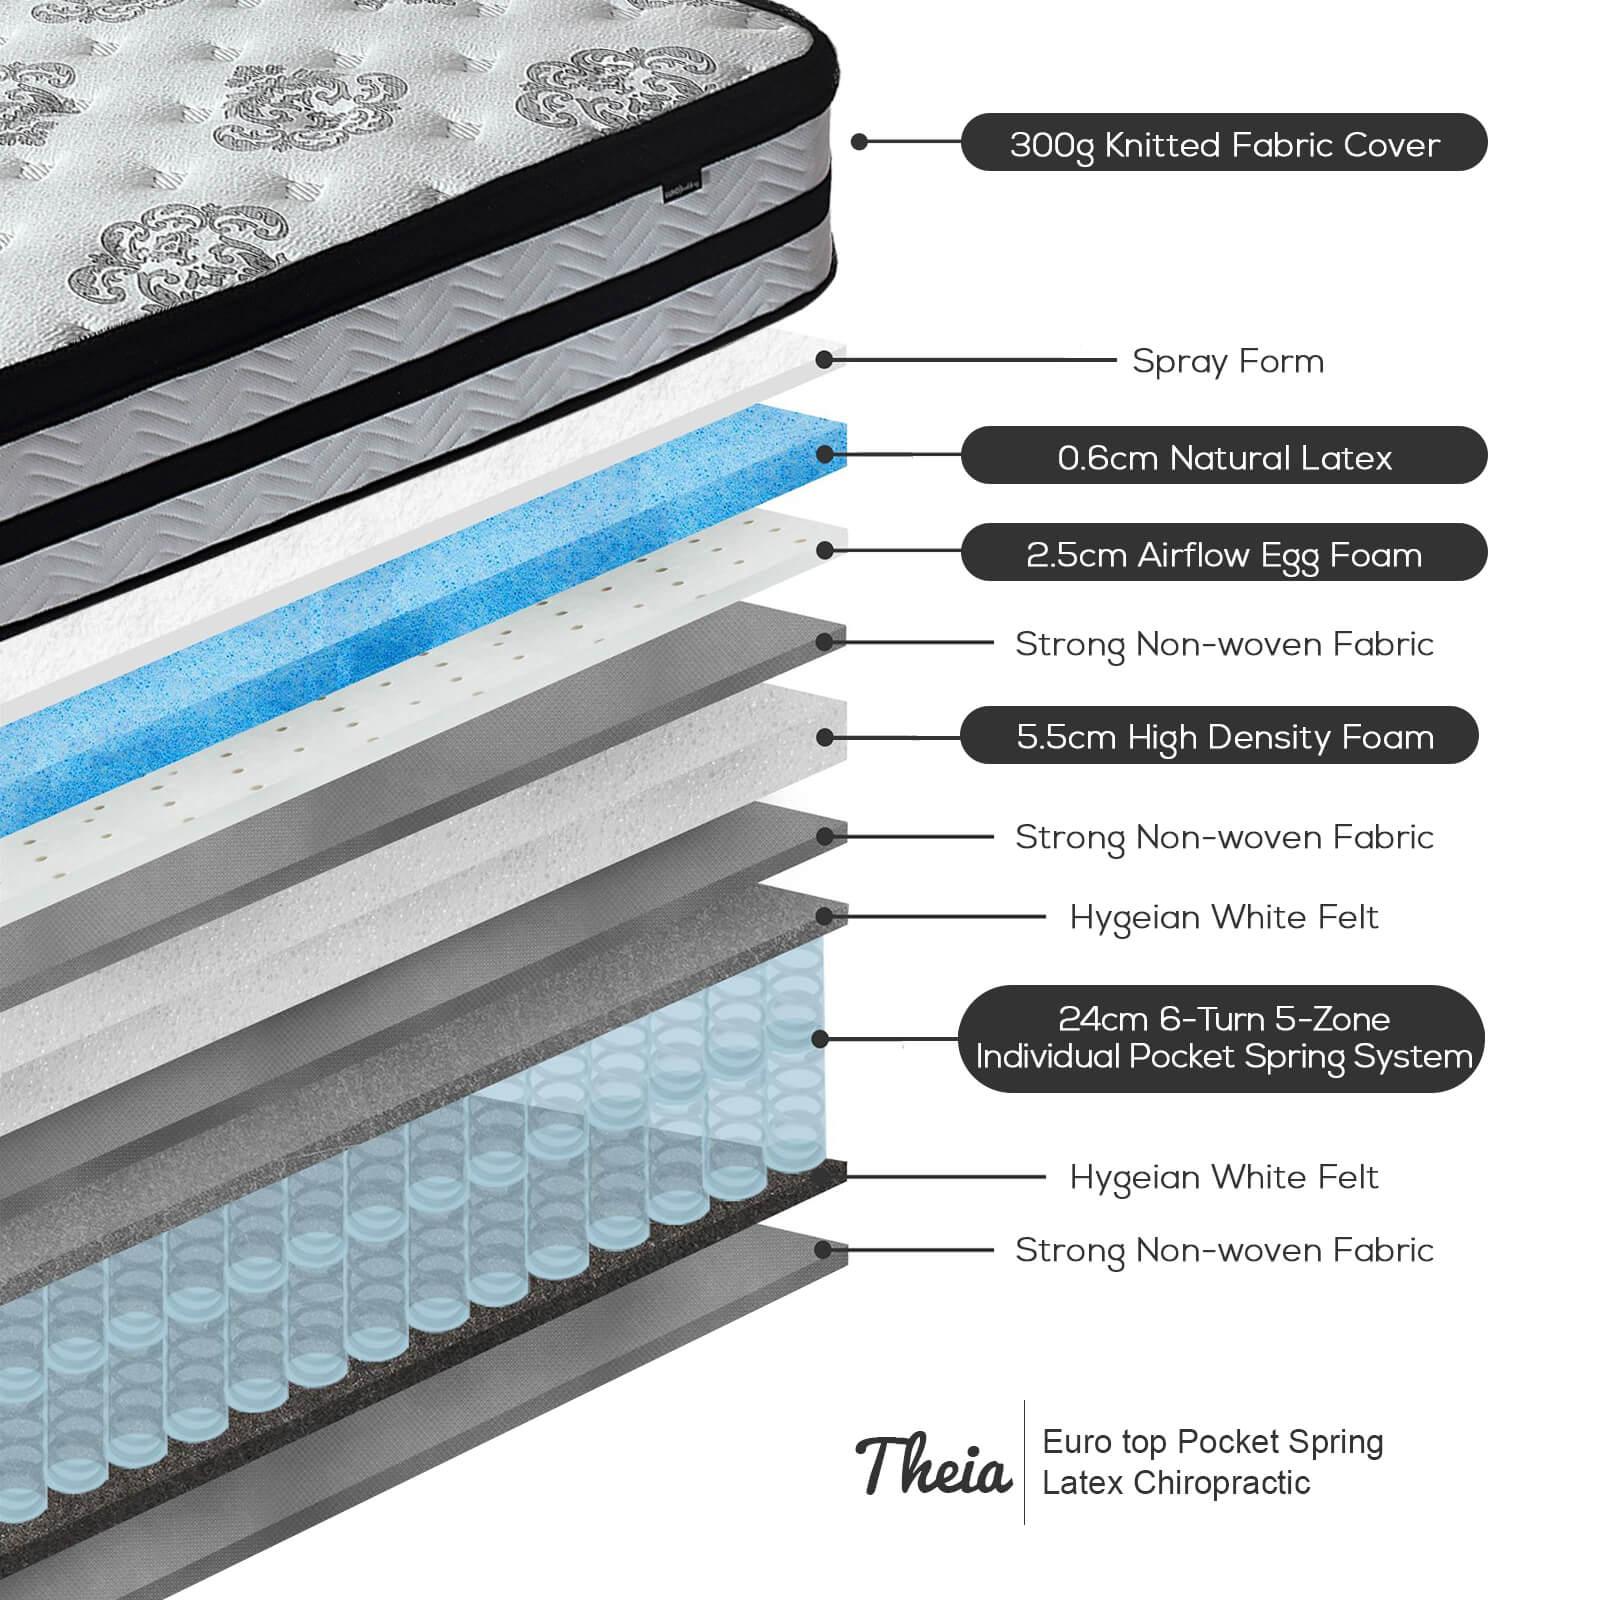 Theia 34cm Euro Top Latex Pocket Spring Mattress - King